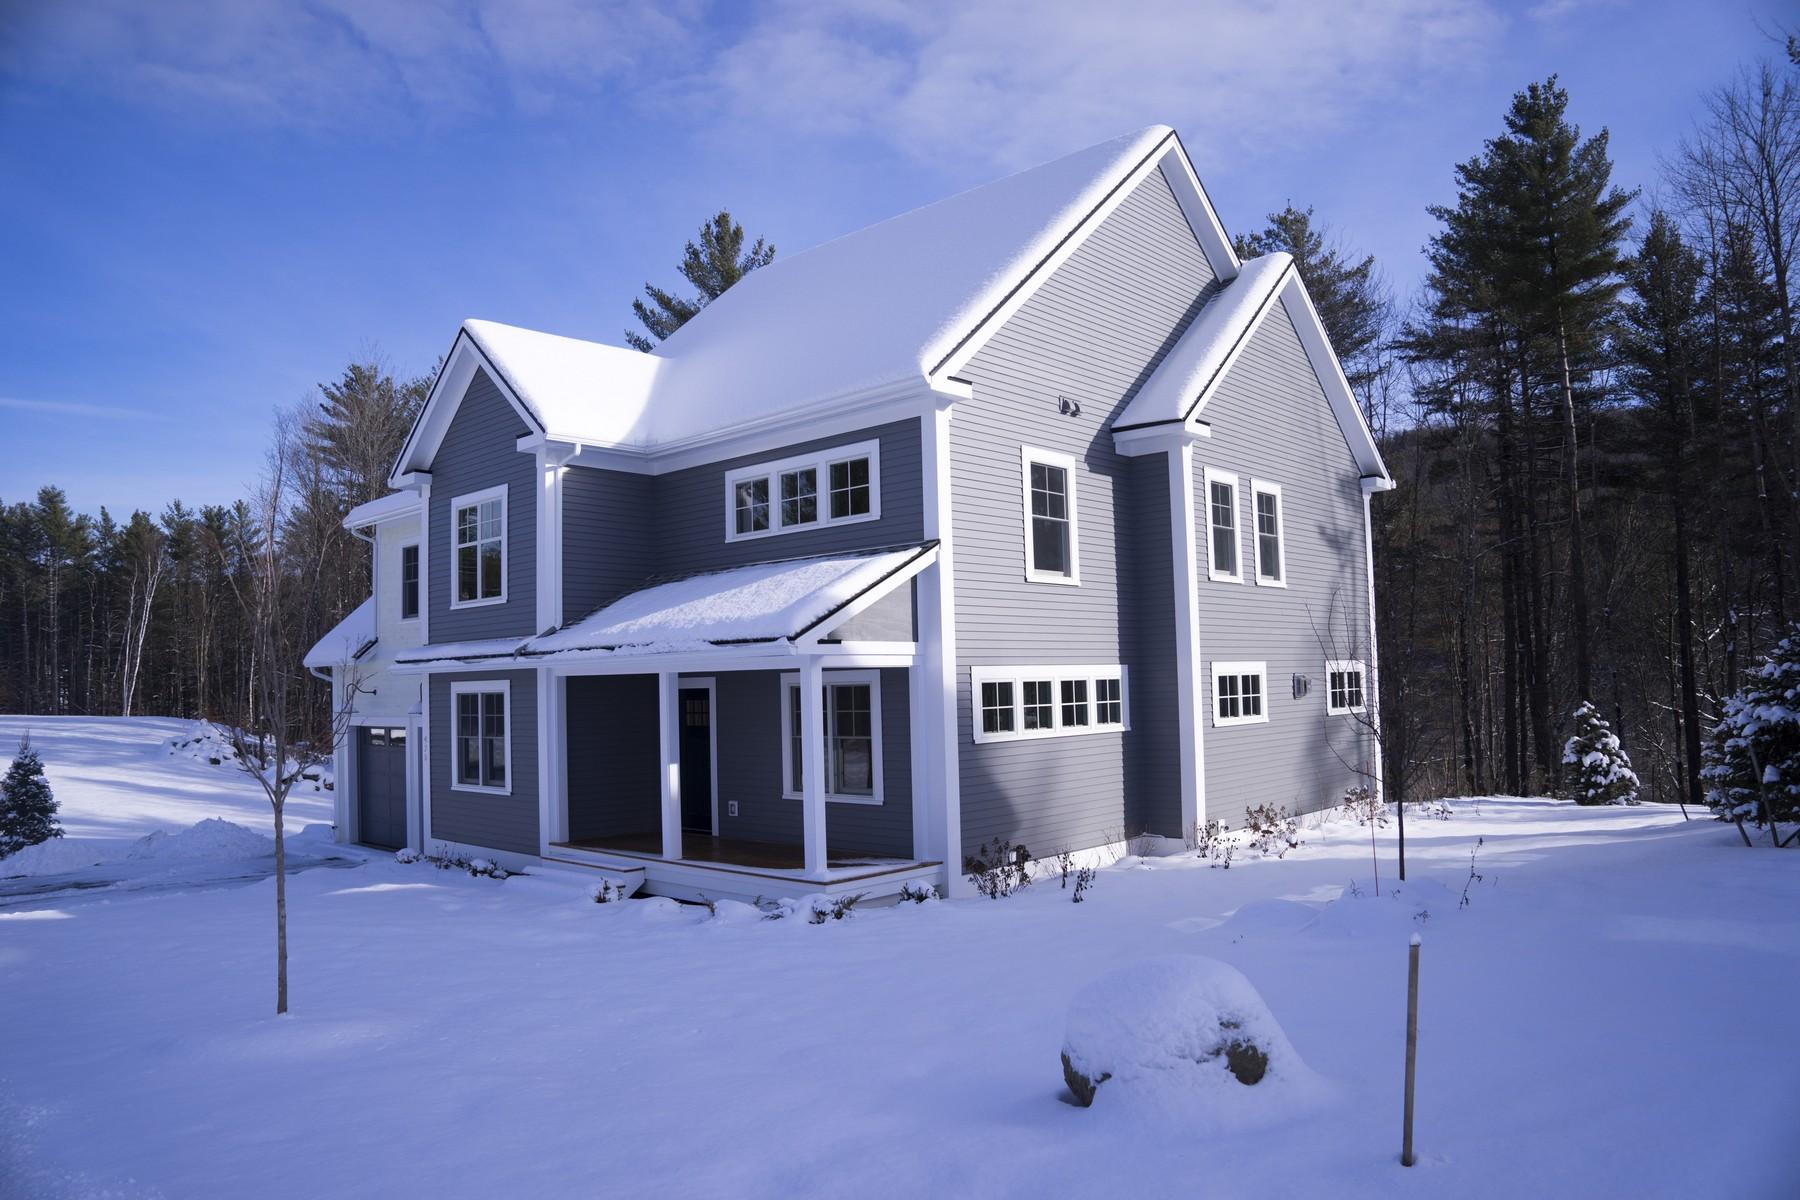 Vivienda unifamiliar por un Venta en 476 Thomas Lane, Stowe 476 Thomas Ln Stowe, Vermont, 05672 Estados Unidos